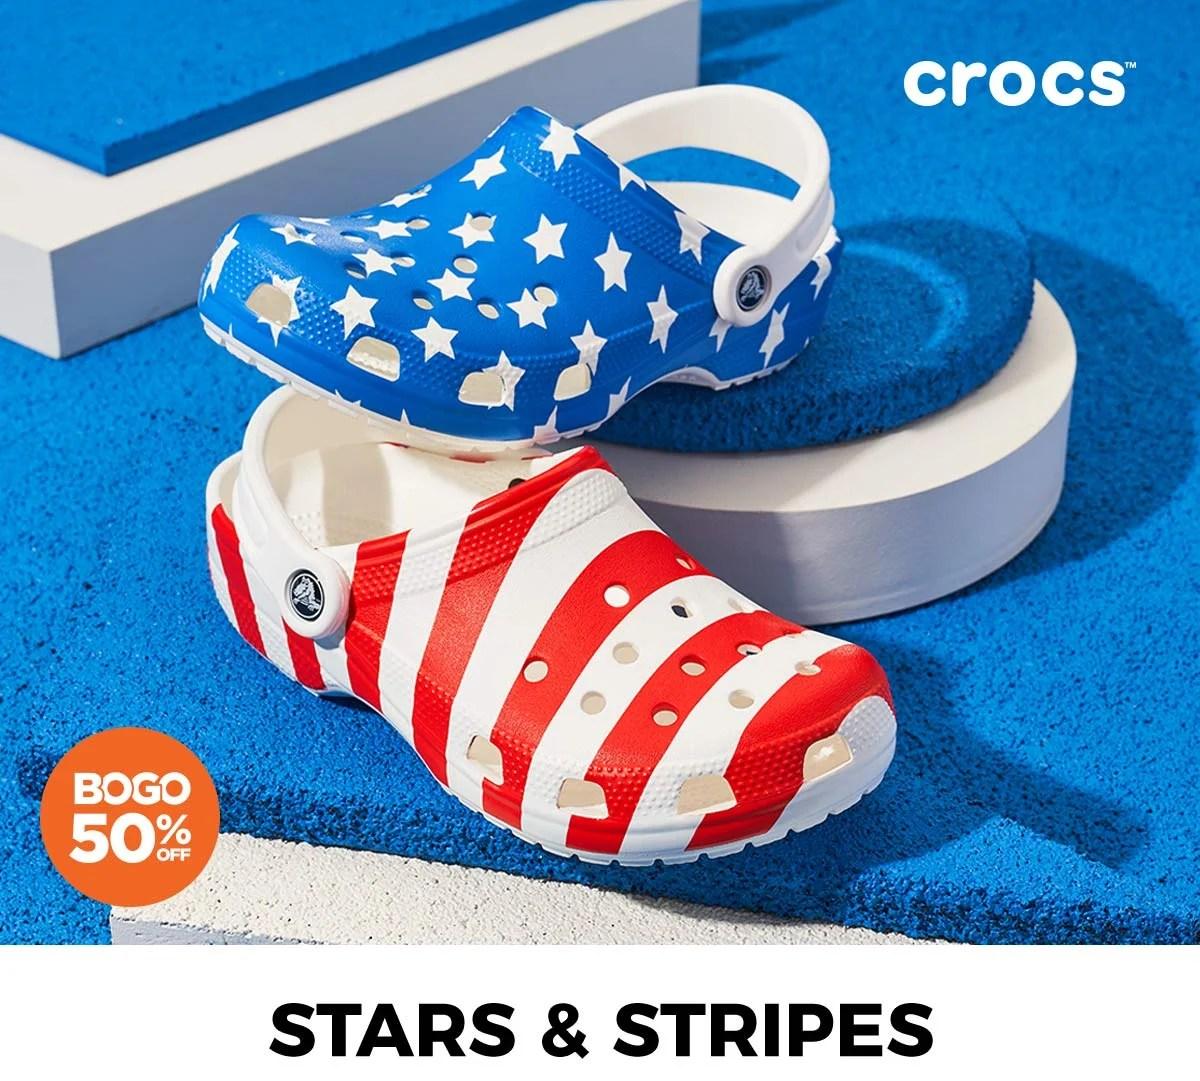 4th of july crocs cheaper than retail